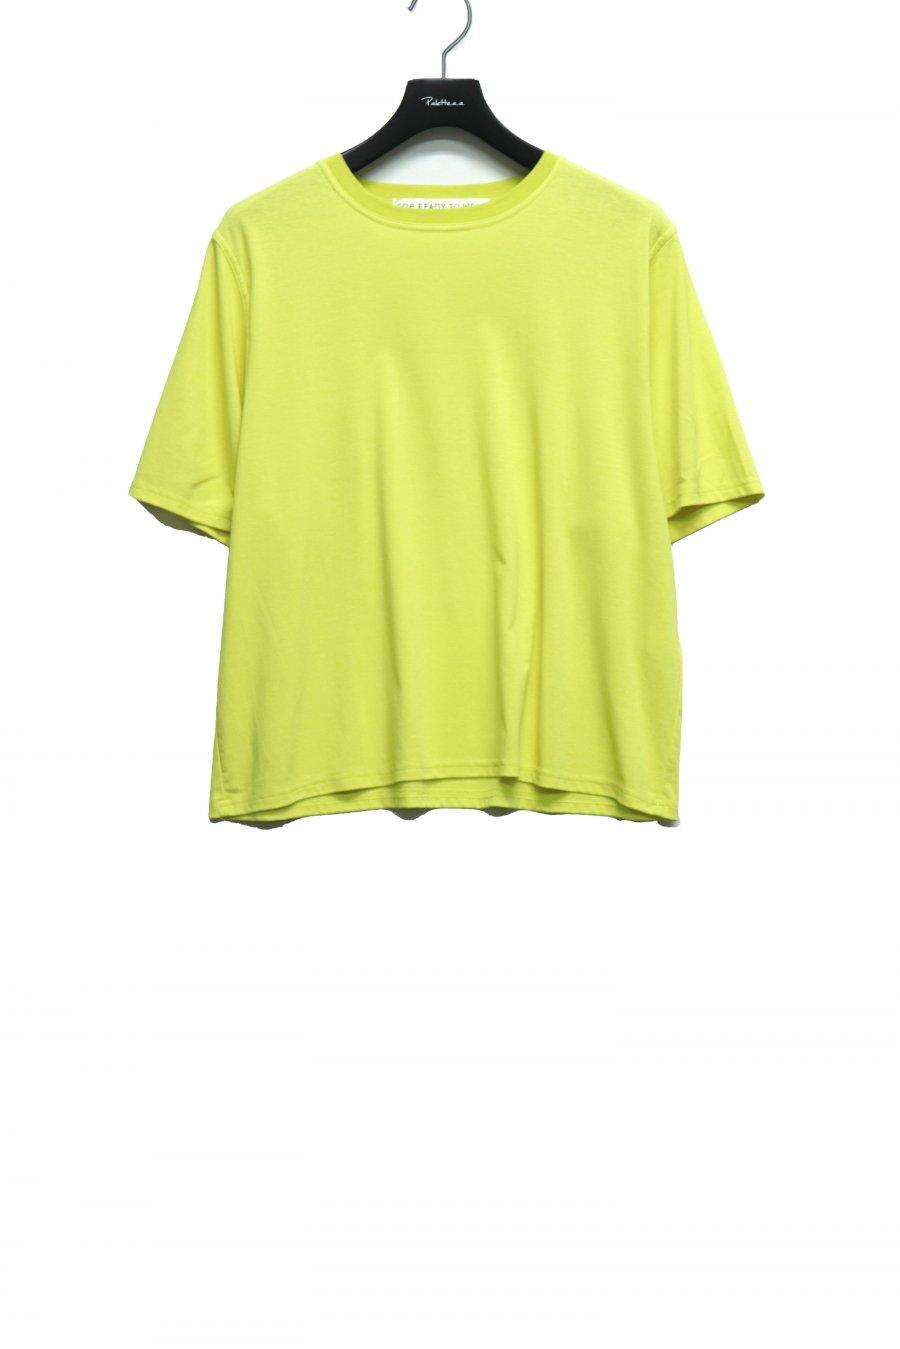 soe  Crewneck T-shirt<img class='new_mark_img2' src='https://img.shop-pro.jp/img/new/icons15.gif' style='border:none;display:inline;margin:0px;padding:0px;width:auto;' />